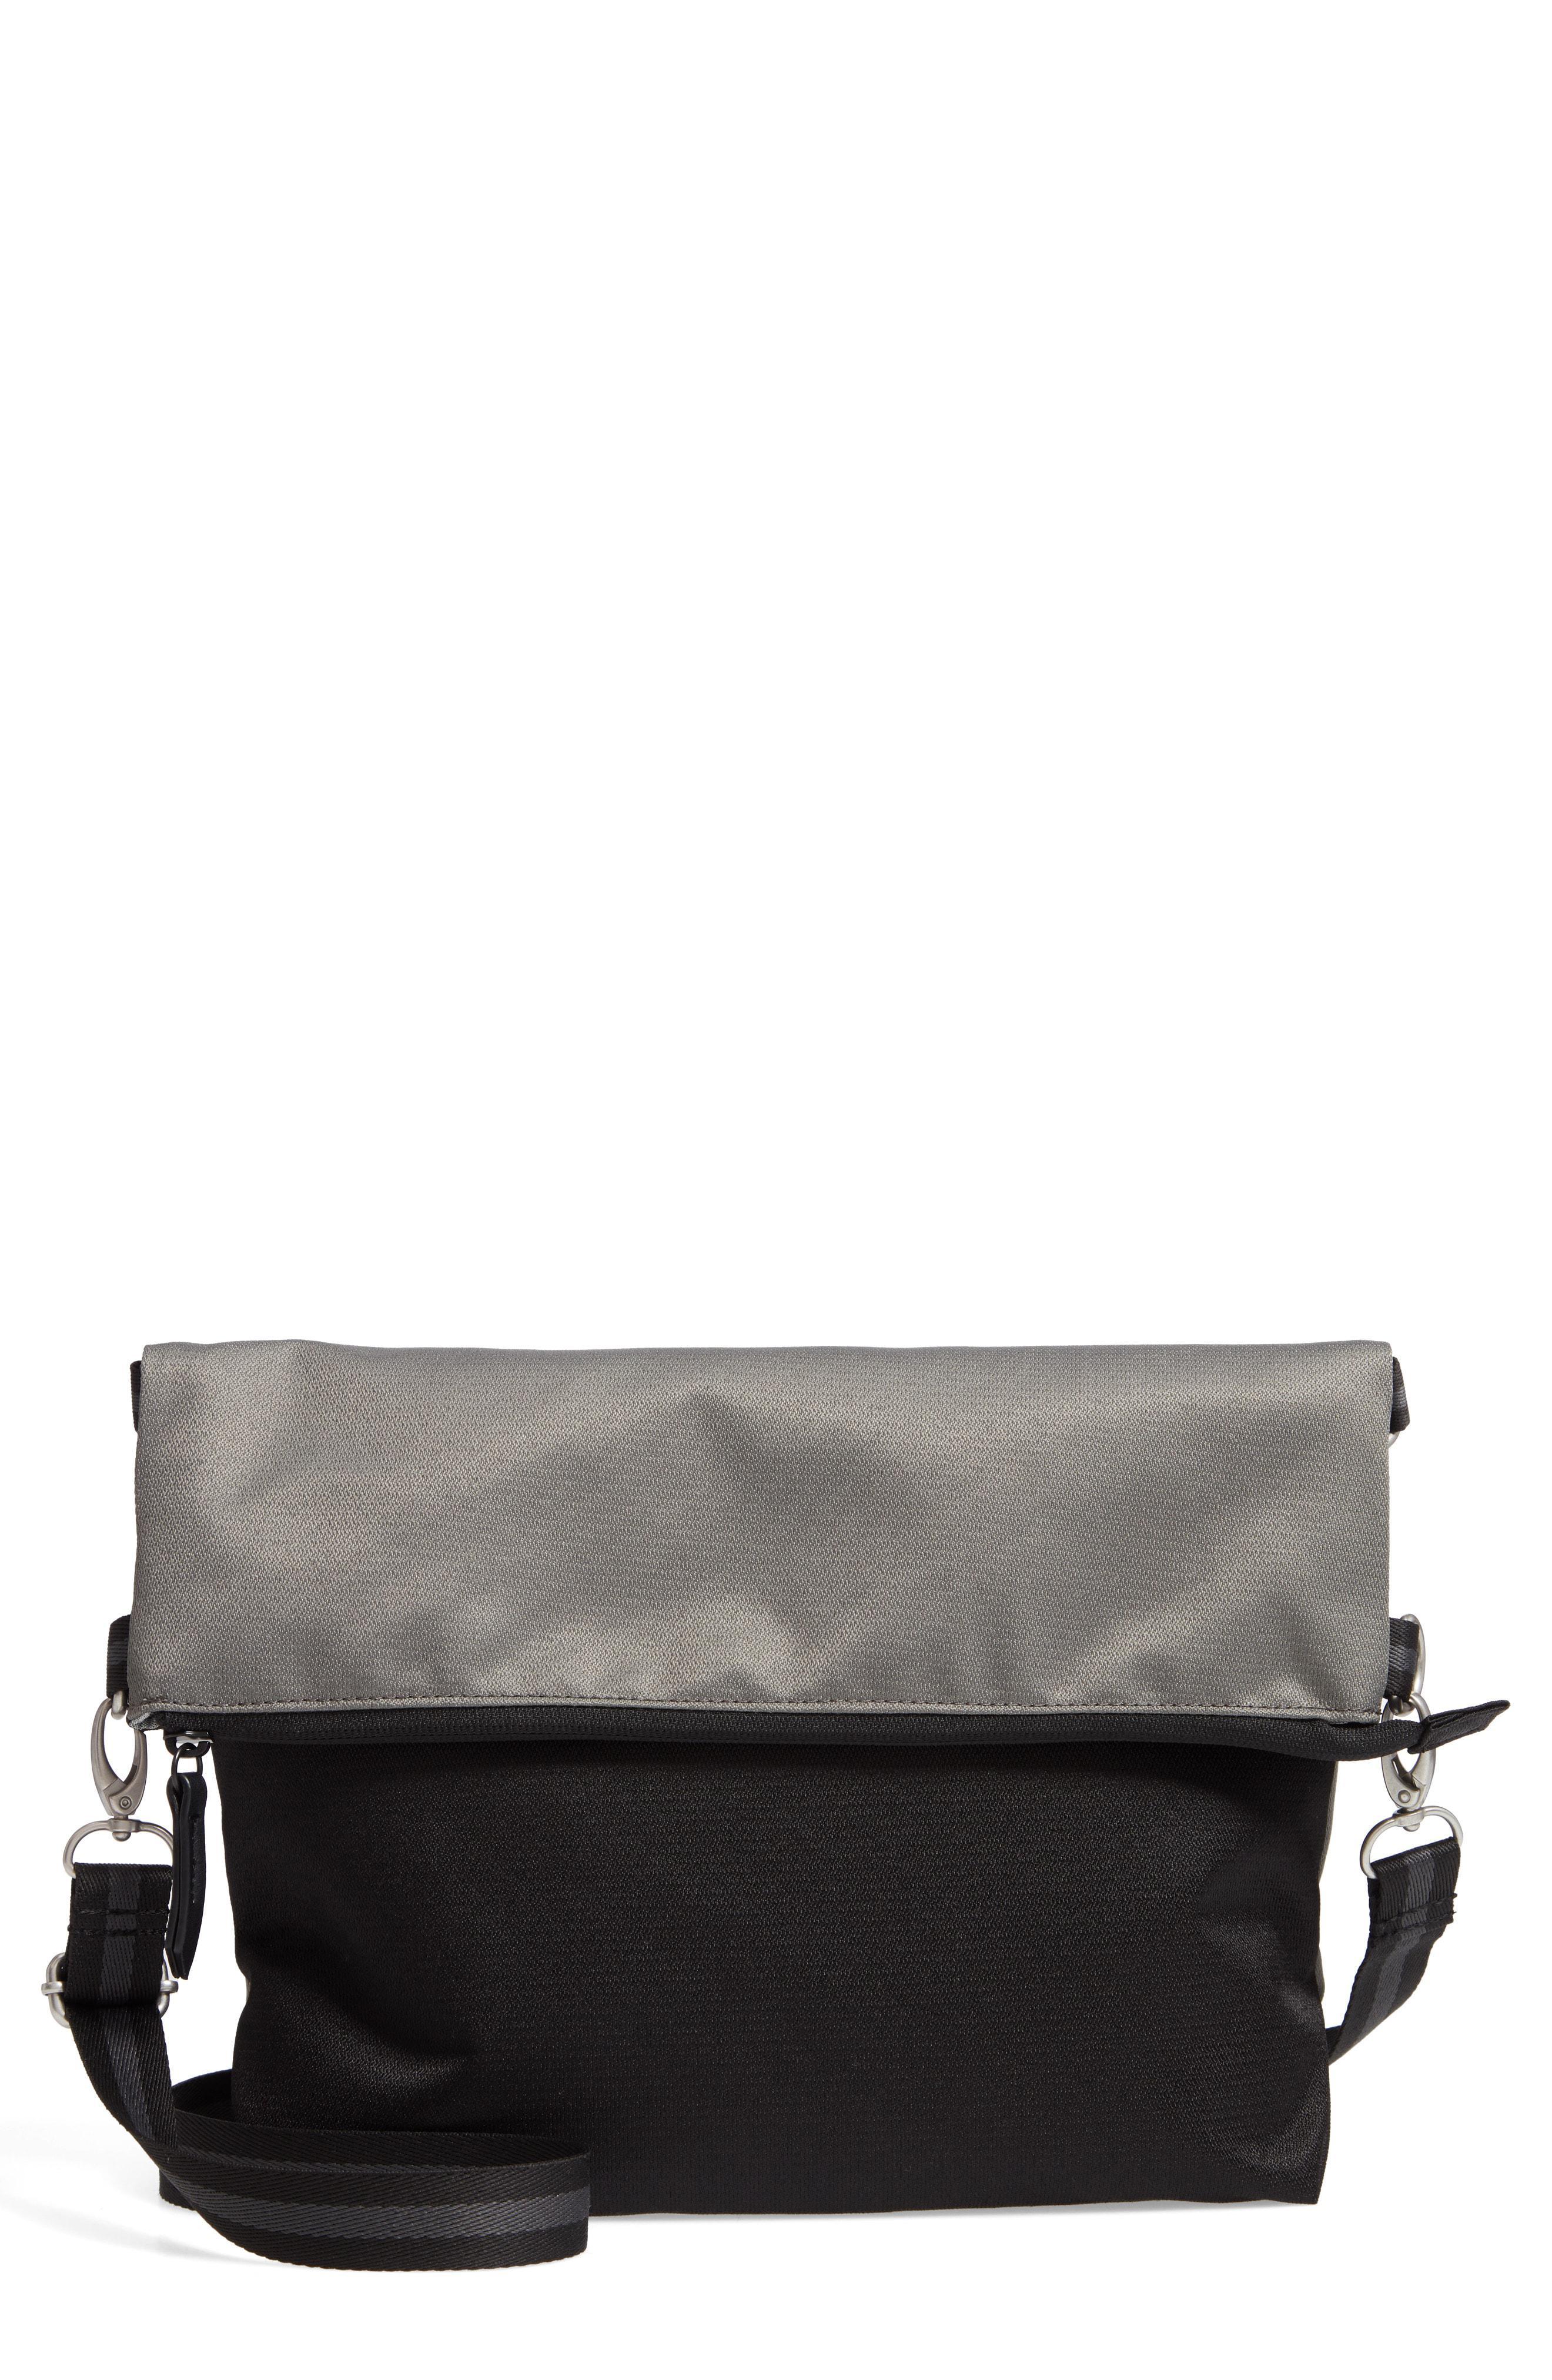 bdfea52128fd Lyst - Nordstrom Vale Rfid Crossbody Bag - in Black